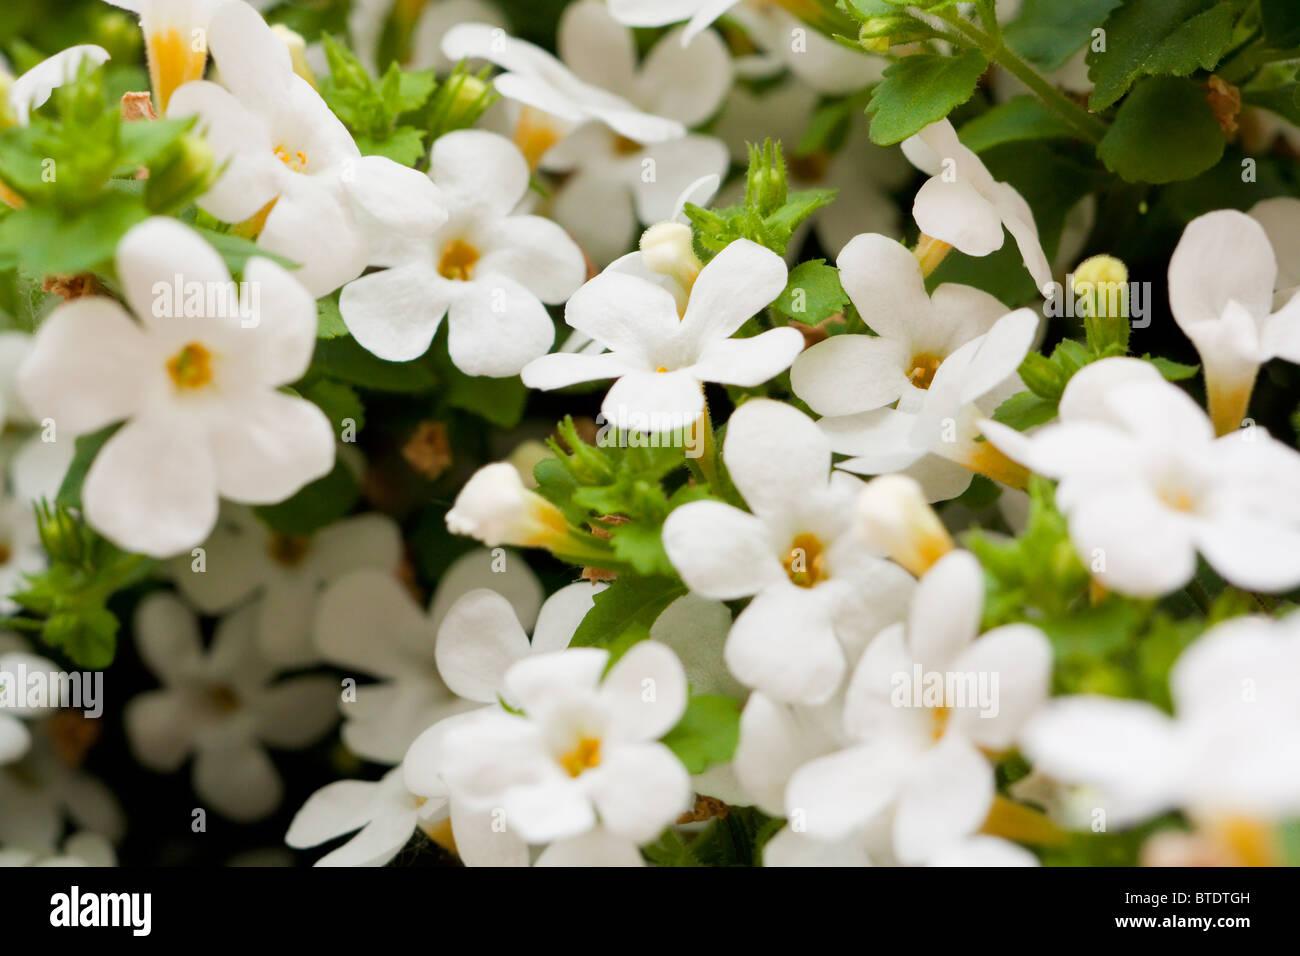 Little white flowers stock photos little white flowers stock background of little white flowers stock image mightylinksfo